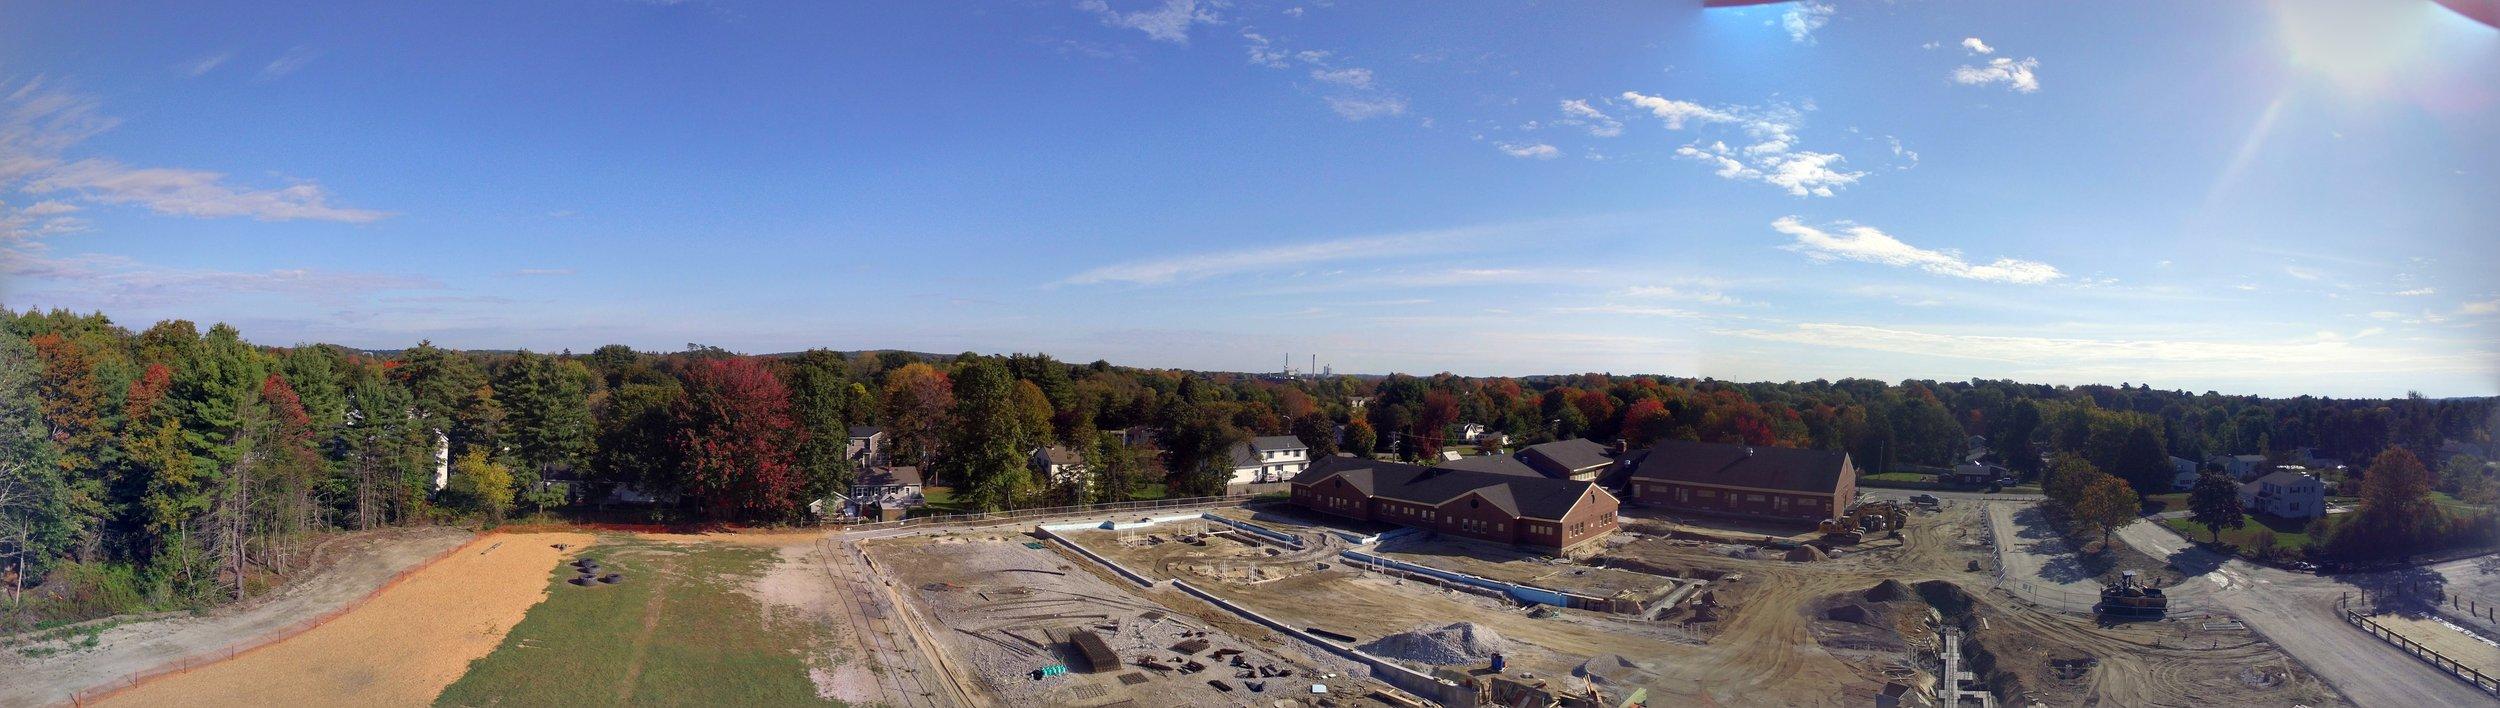 Aerial Panoramic Photo October 7, 2017